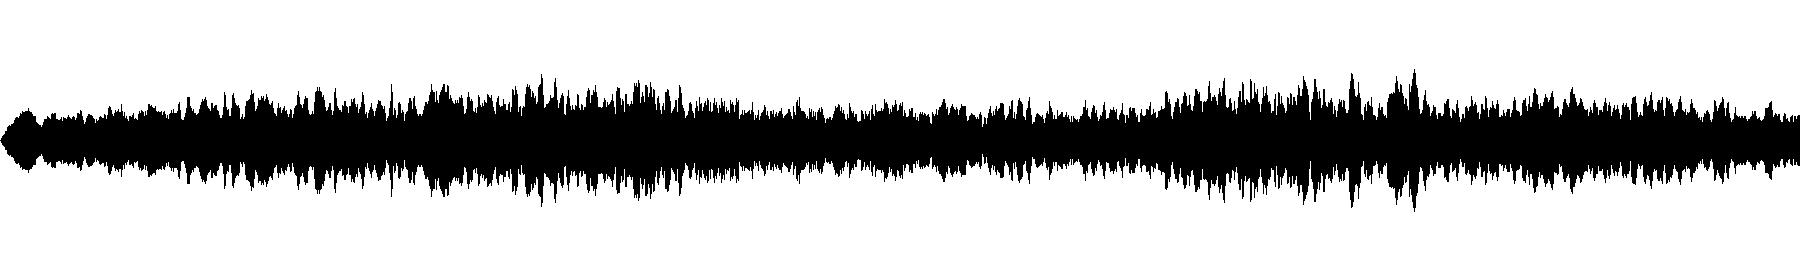 cymatics   dubstep toolkit background fx 1   150 bpm e